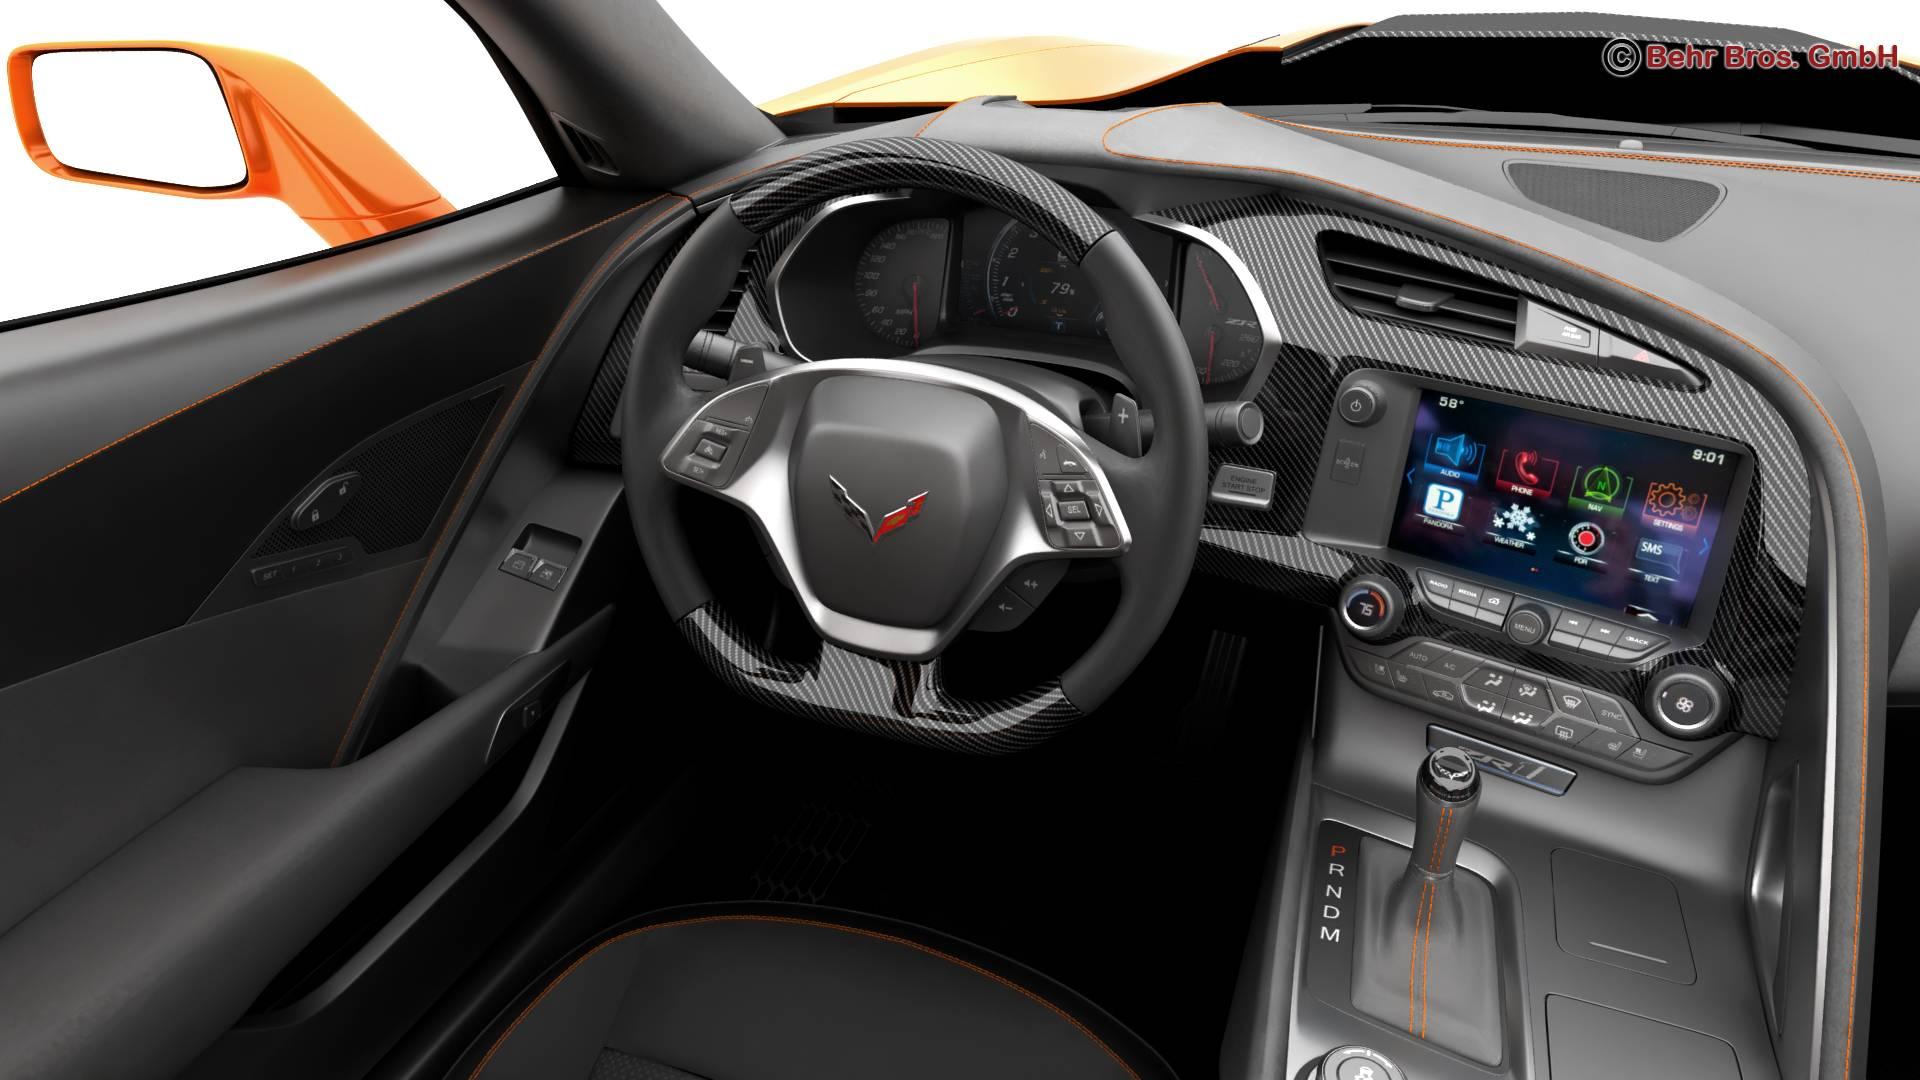 chevrolet corvette zr1 2019 3d model 3ds max fbx c4d lwo ma mb obj 275980